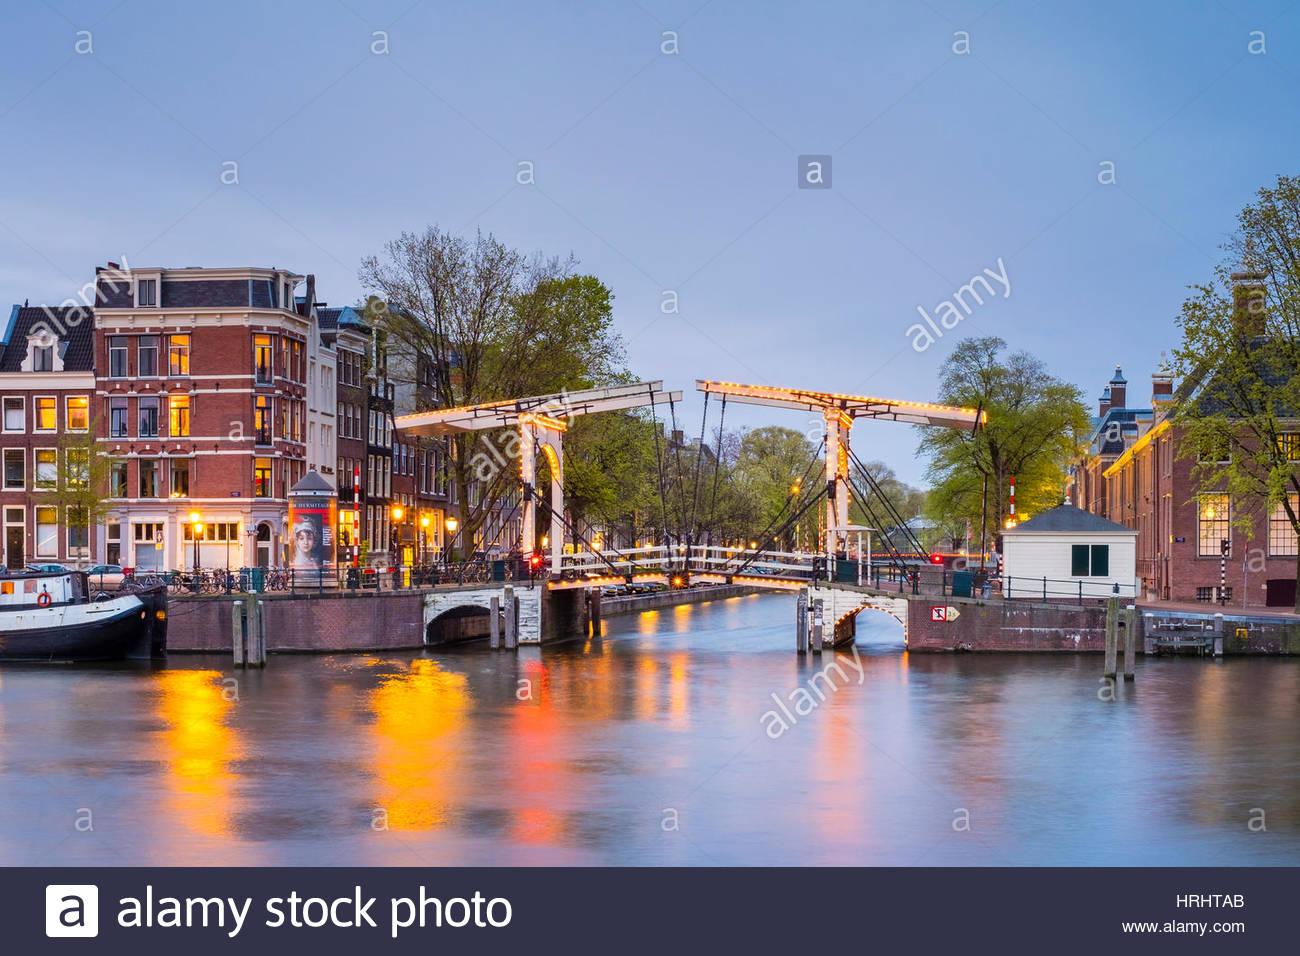 Amsterdam, North Holland, Netherlands - Stock Image